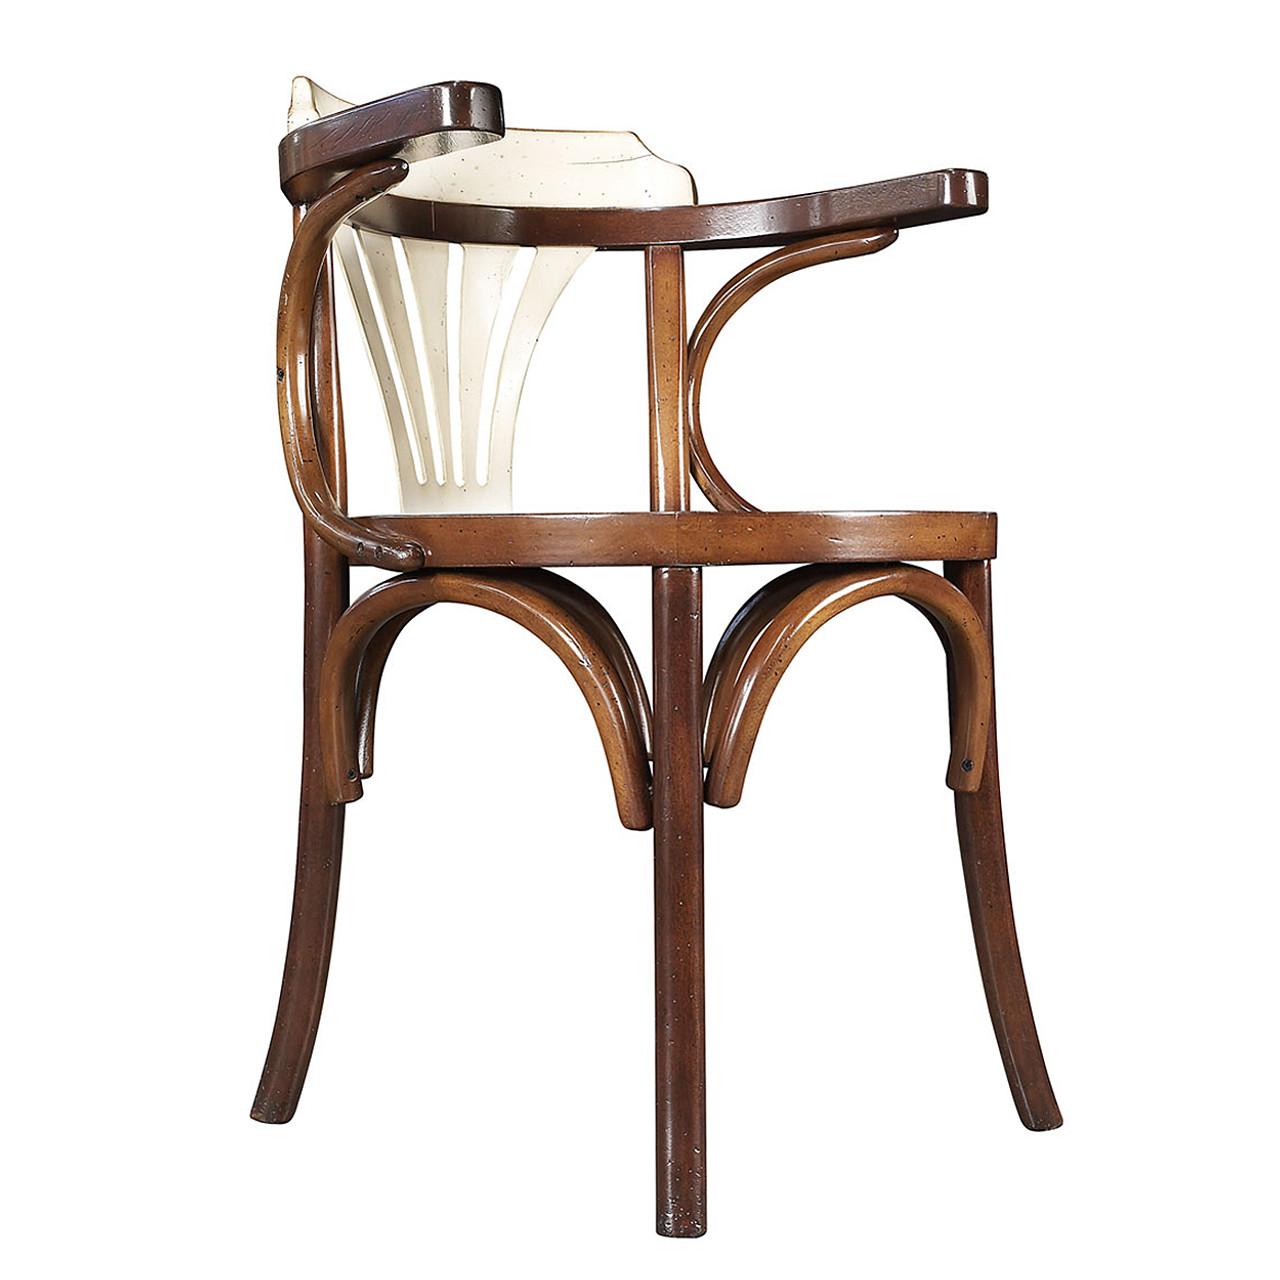 Nautical office furniture Background Design Navy Chair Honey Ivory Nautical Office Desk Furniture Servicesprintco Navy Chair Honey Ivory Finish 31